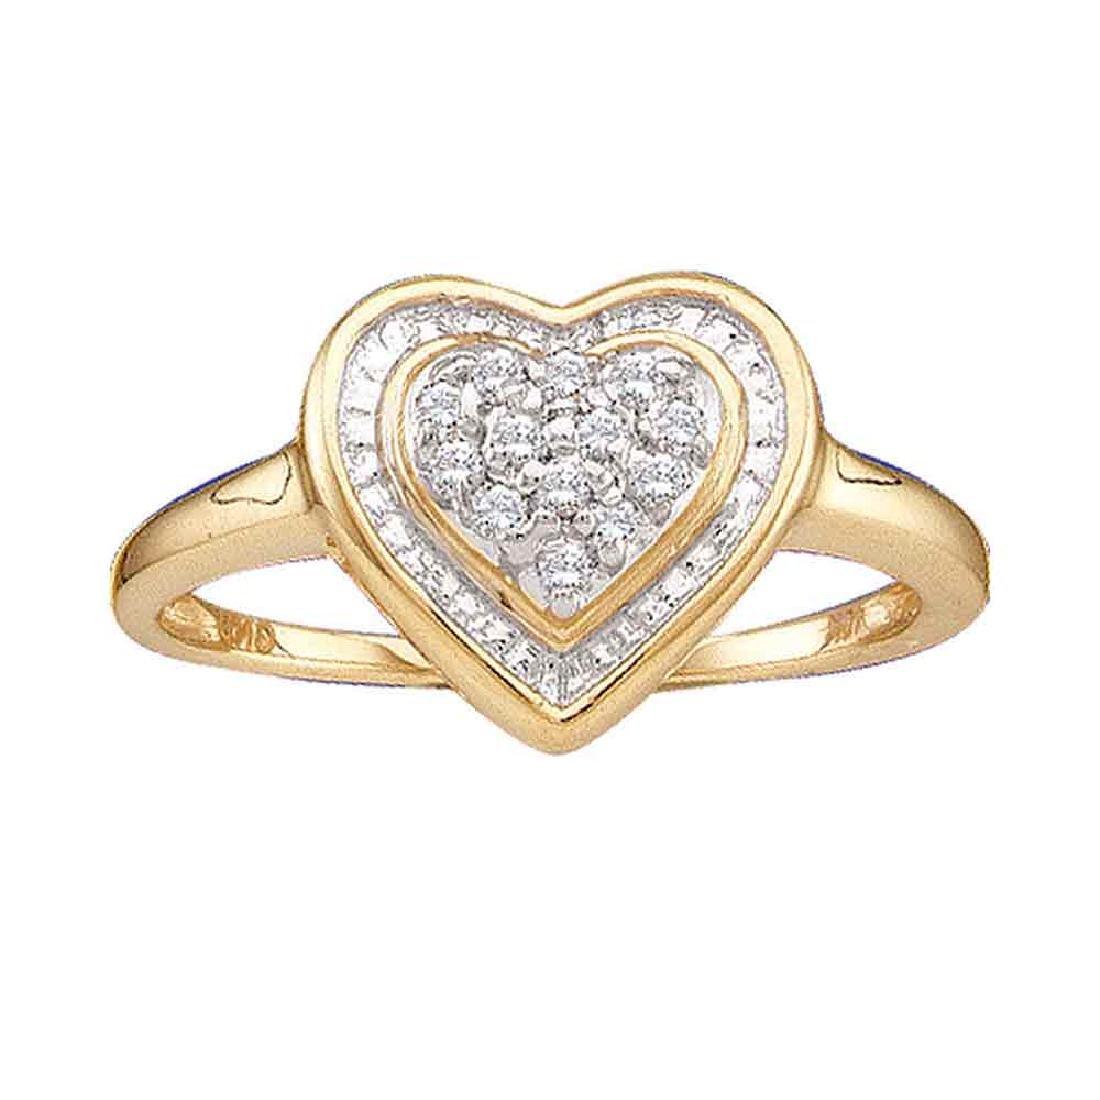 0.11 CTW Diamond Heart Ring 14KT Yellow Gold -